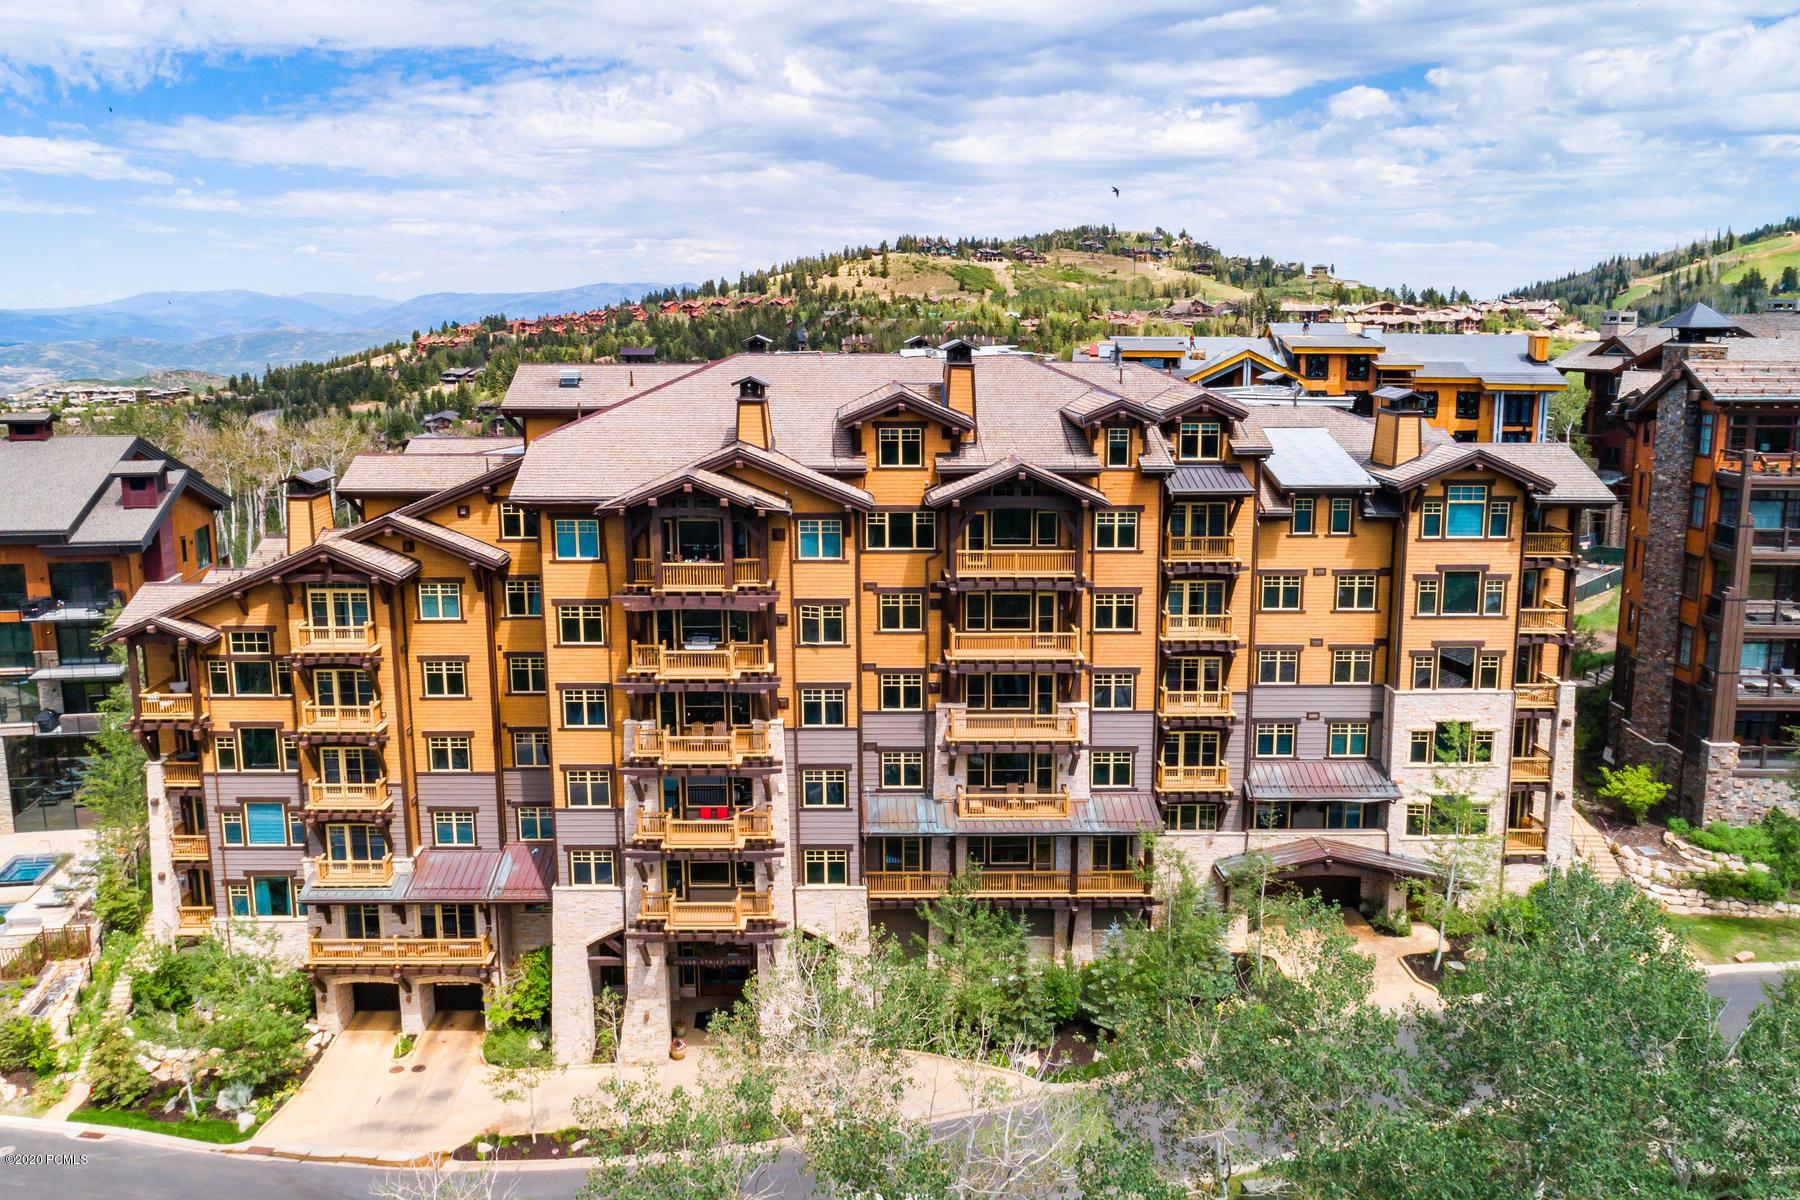 8902 Empire Club Drive, Park City, Utah 84060, 3 Bedrooms Bedrooms, ,3 BathroomsBathrooms,Condominium,For Sale,Empire Club,12002458